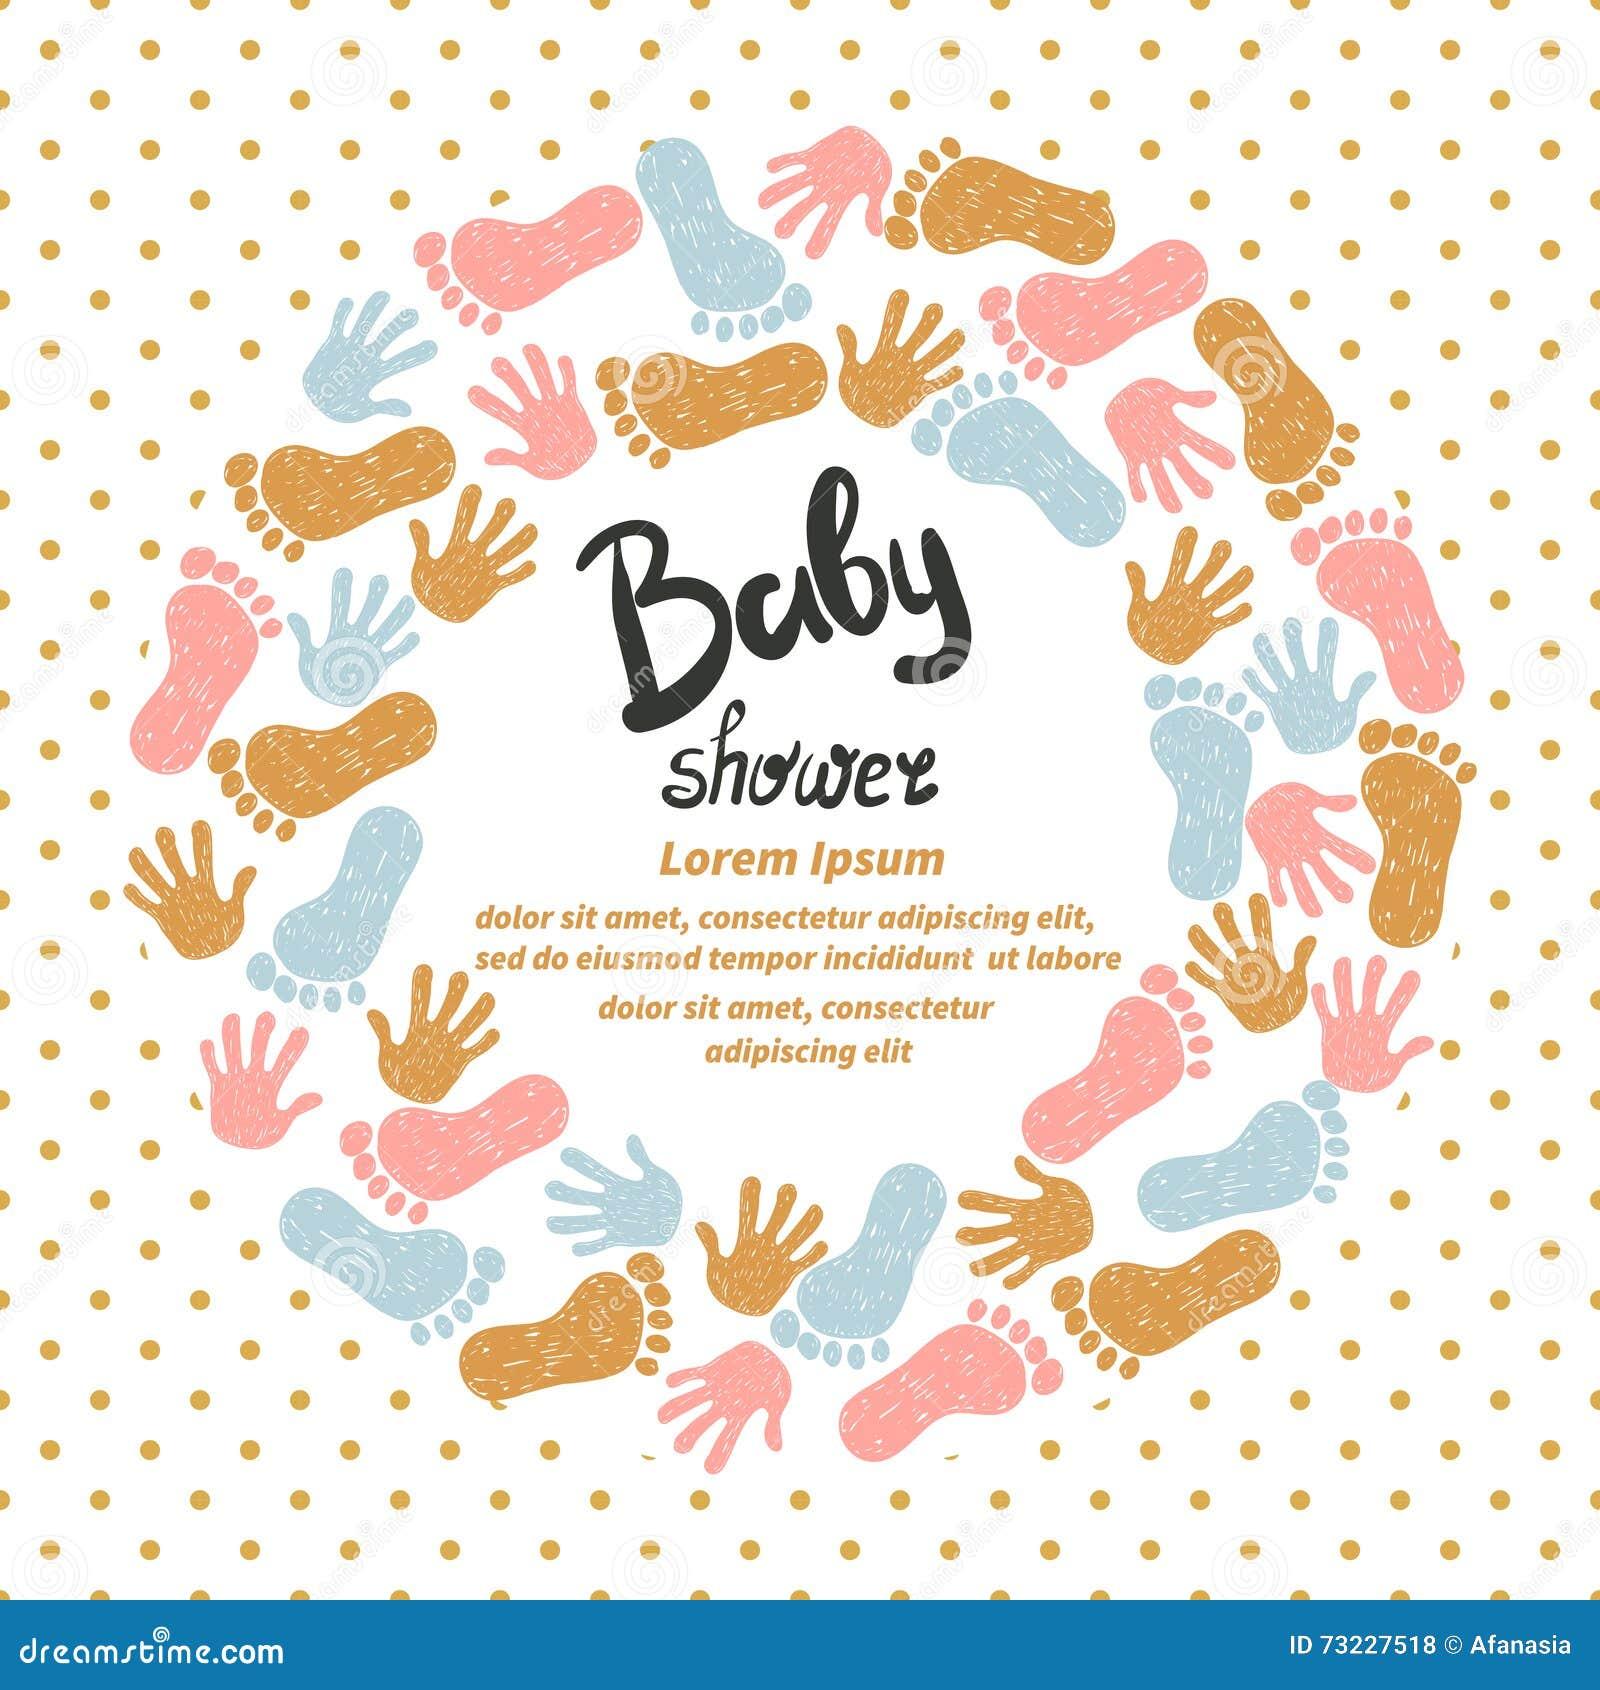 Baby Shower Invitation Card Design Stock Vector